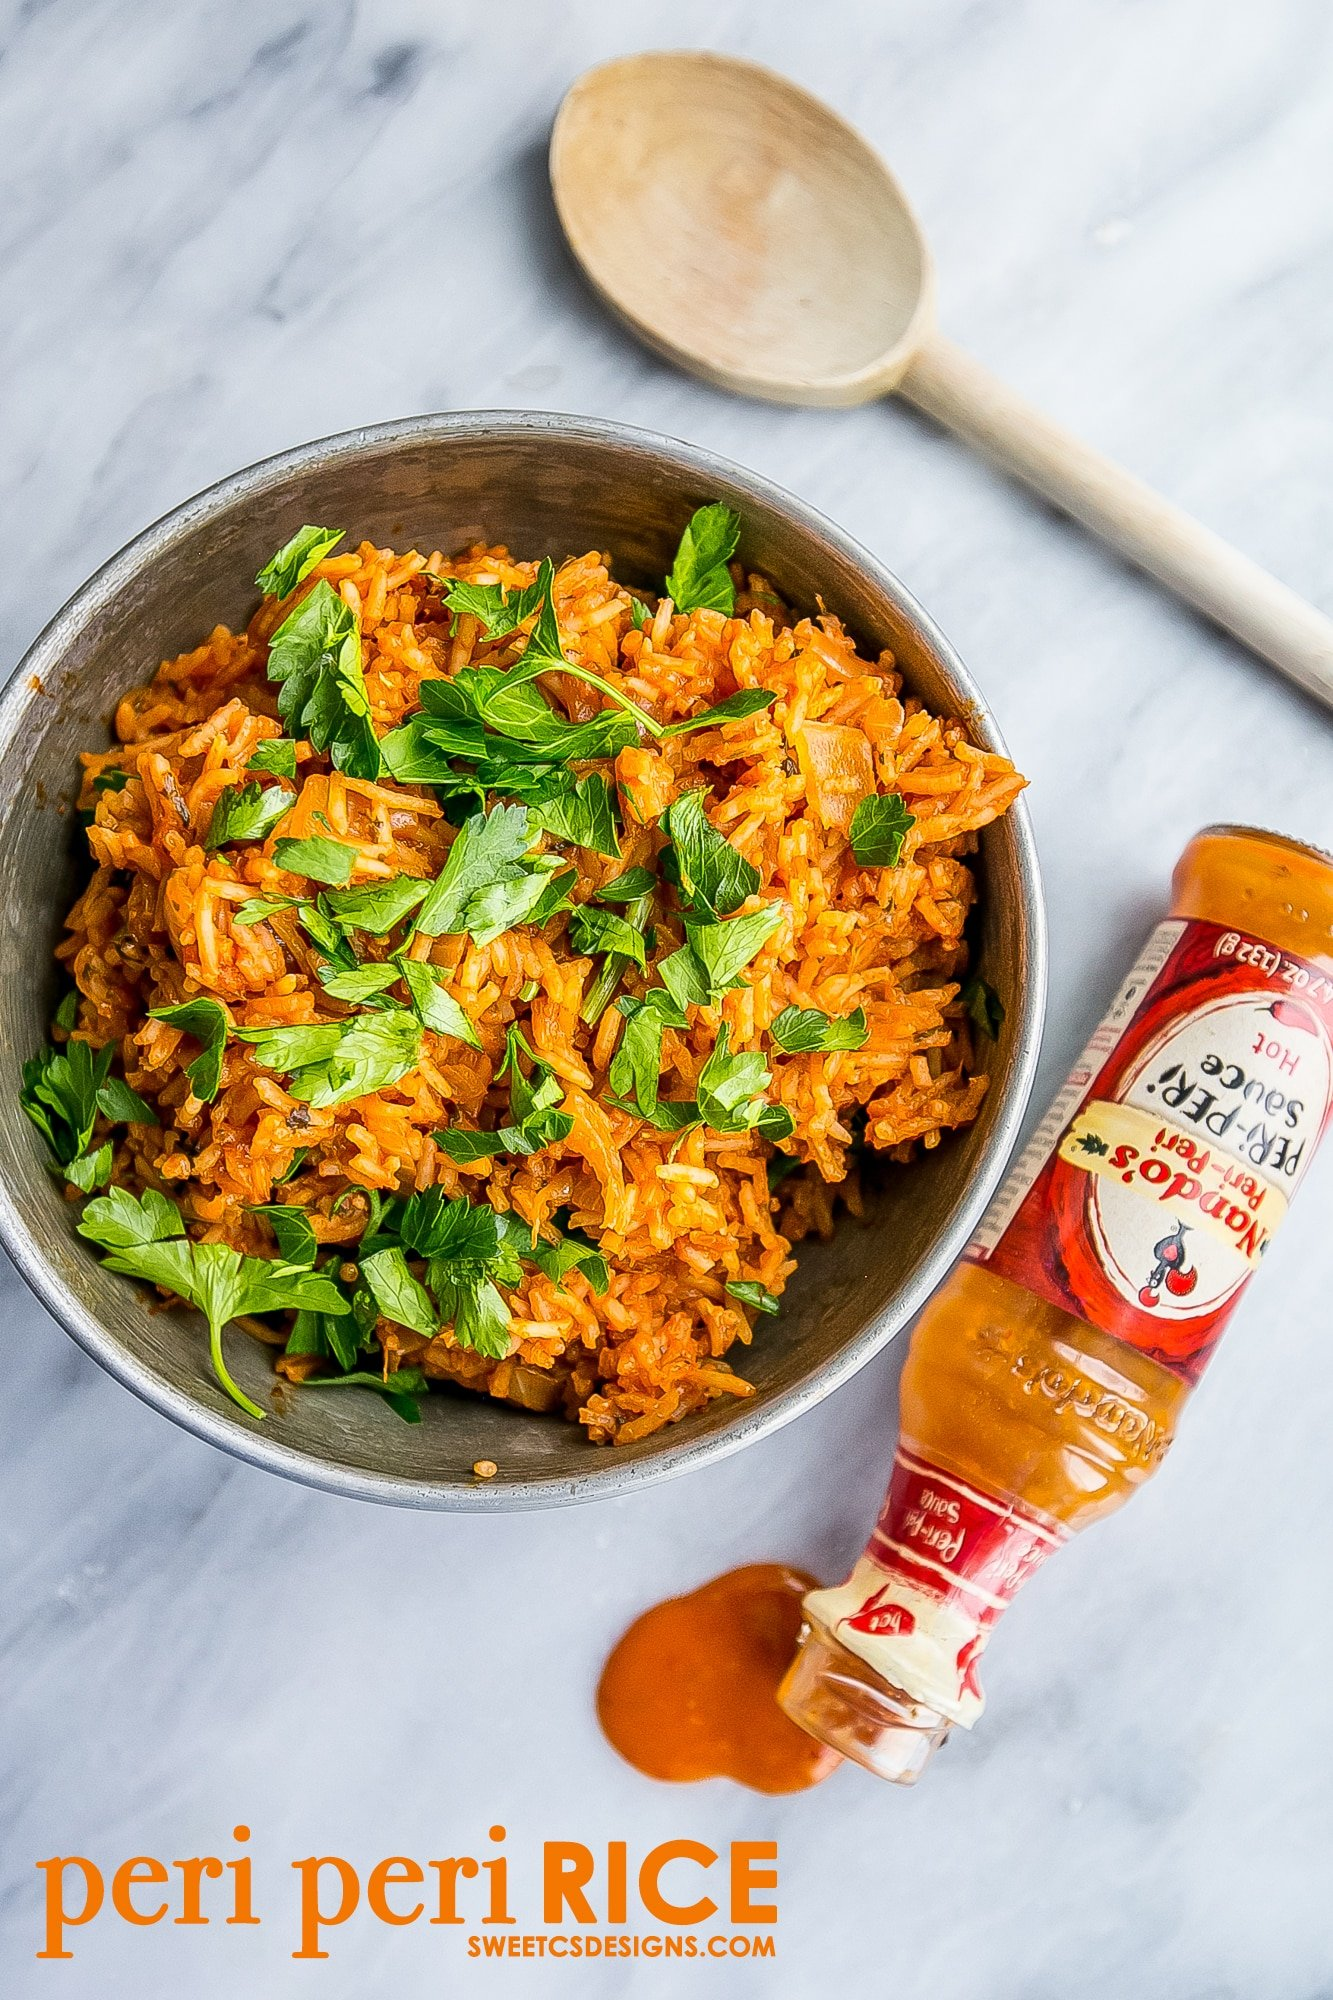 Nandos spicy peri peri rice at home - so easy and delicious!